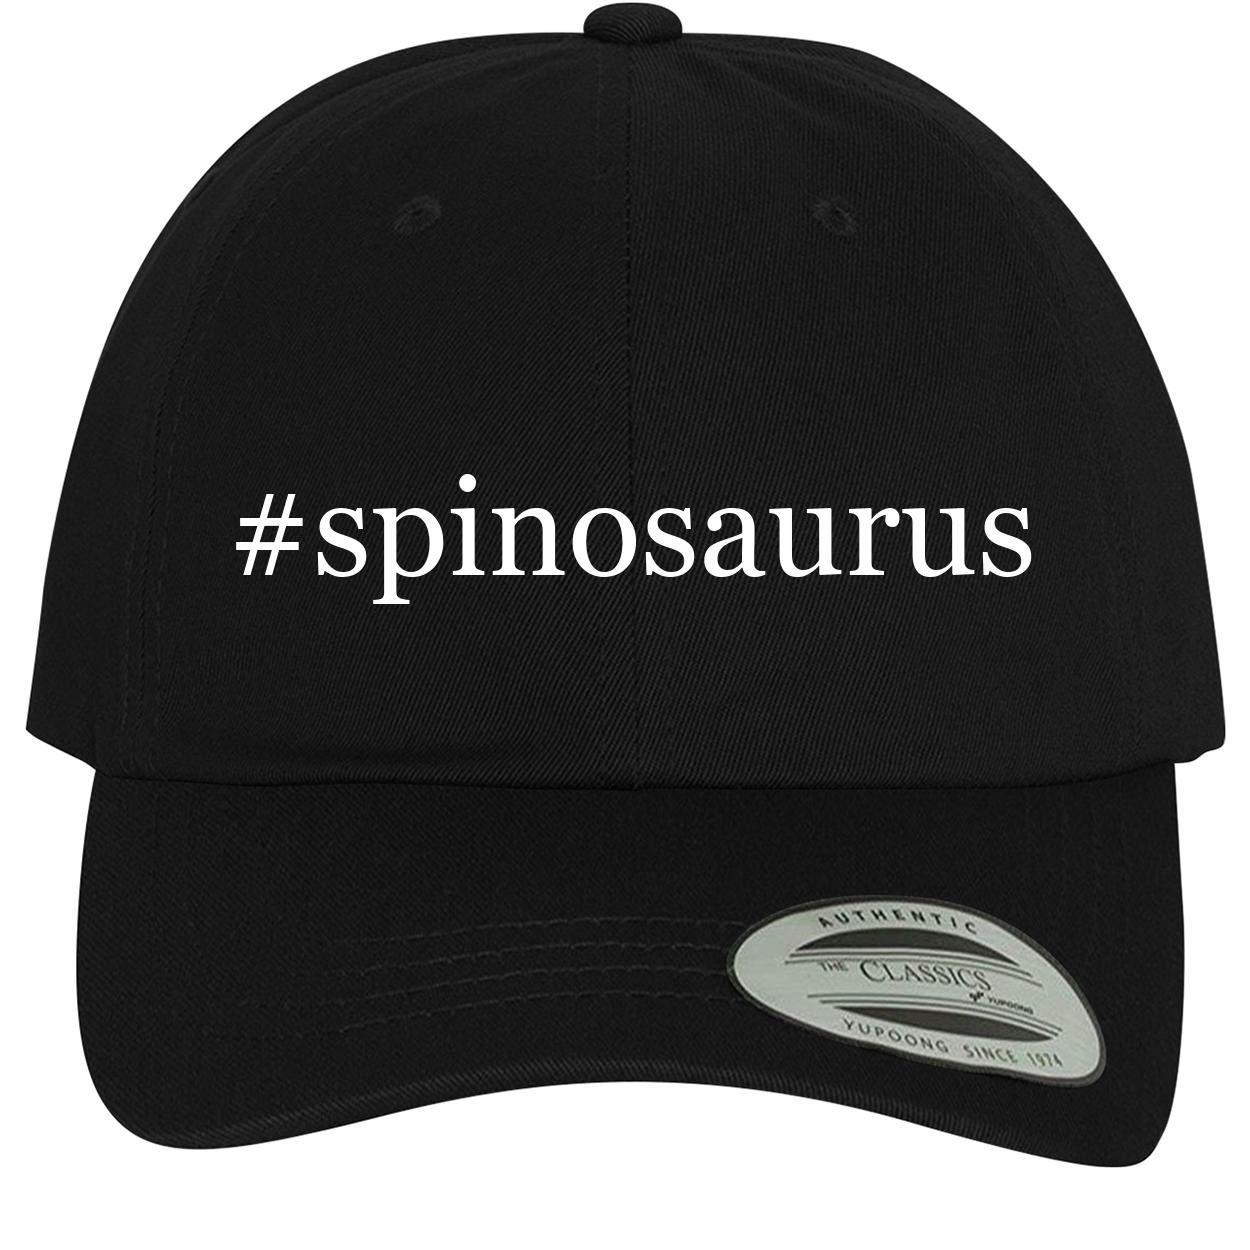 BH Cool Designs #Spinosaurus Comfortable Dad Hat Baseball Cap